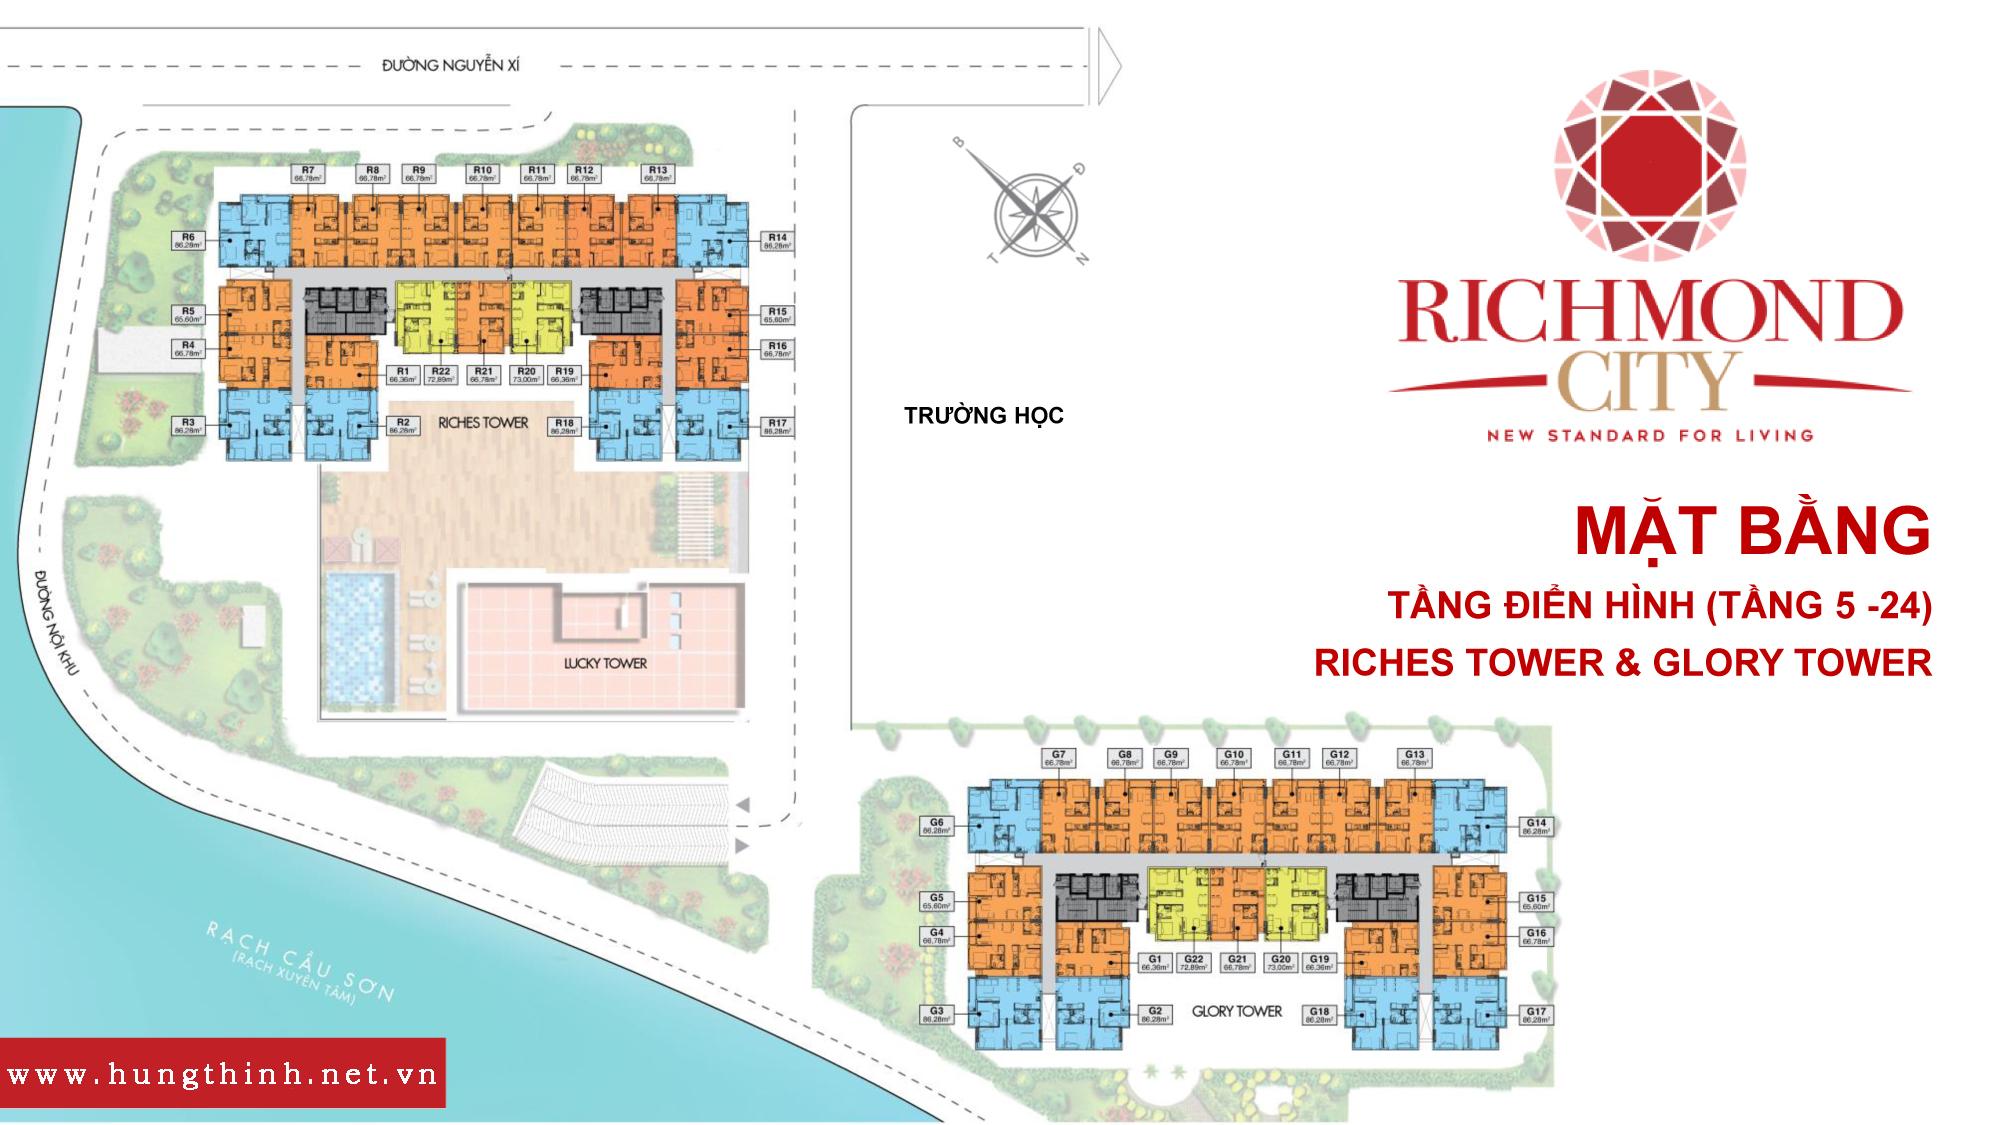 Mặt bằng căn hộ richmond city